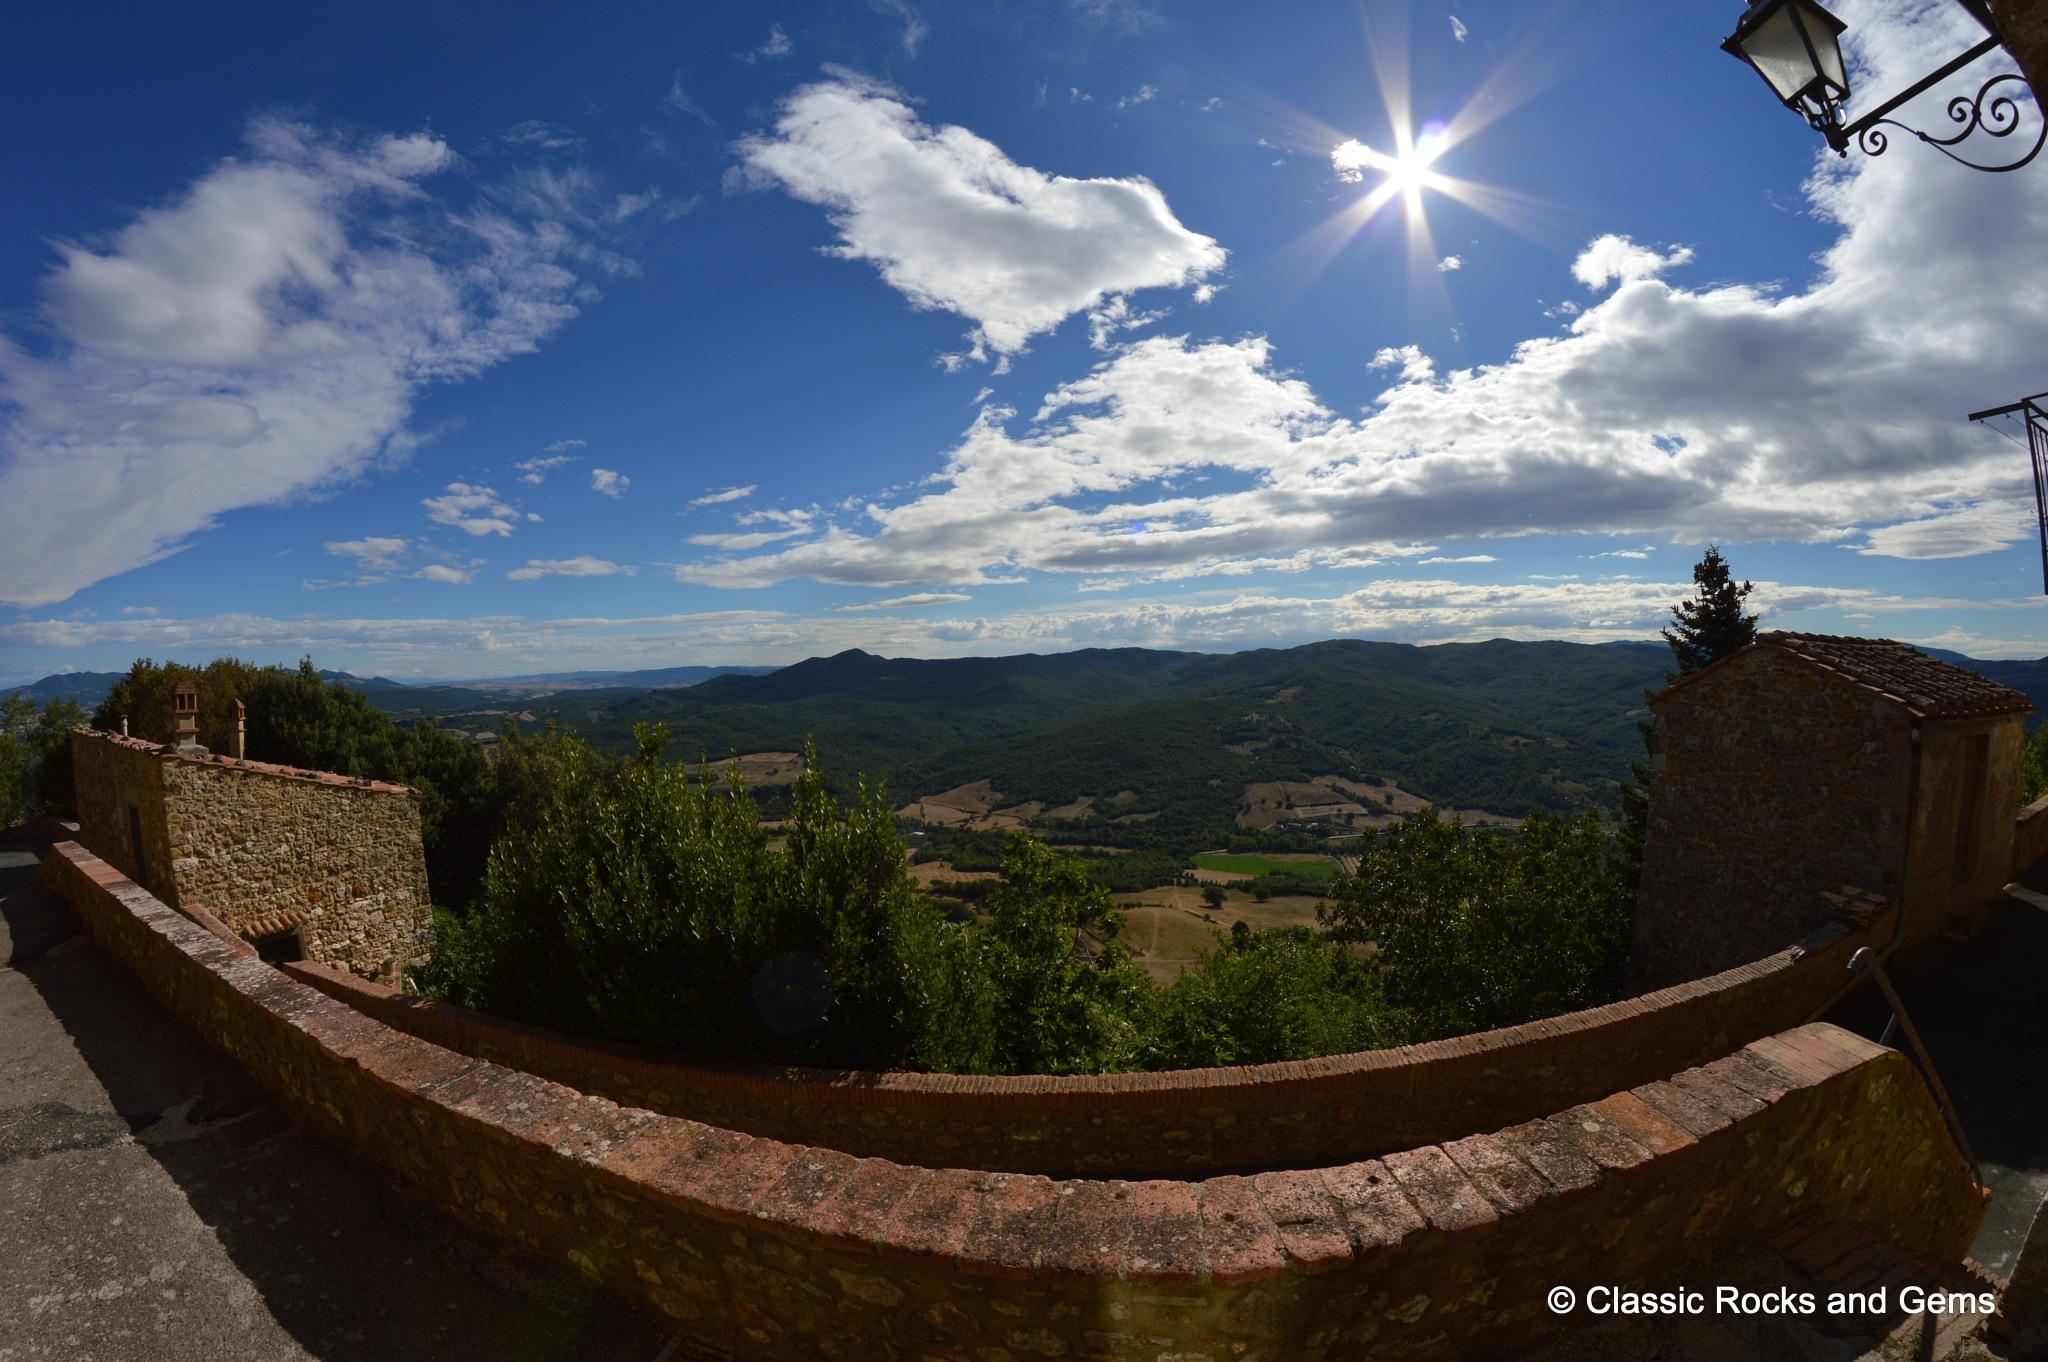 La Sassa - Tuscany by classicrocksandgems